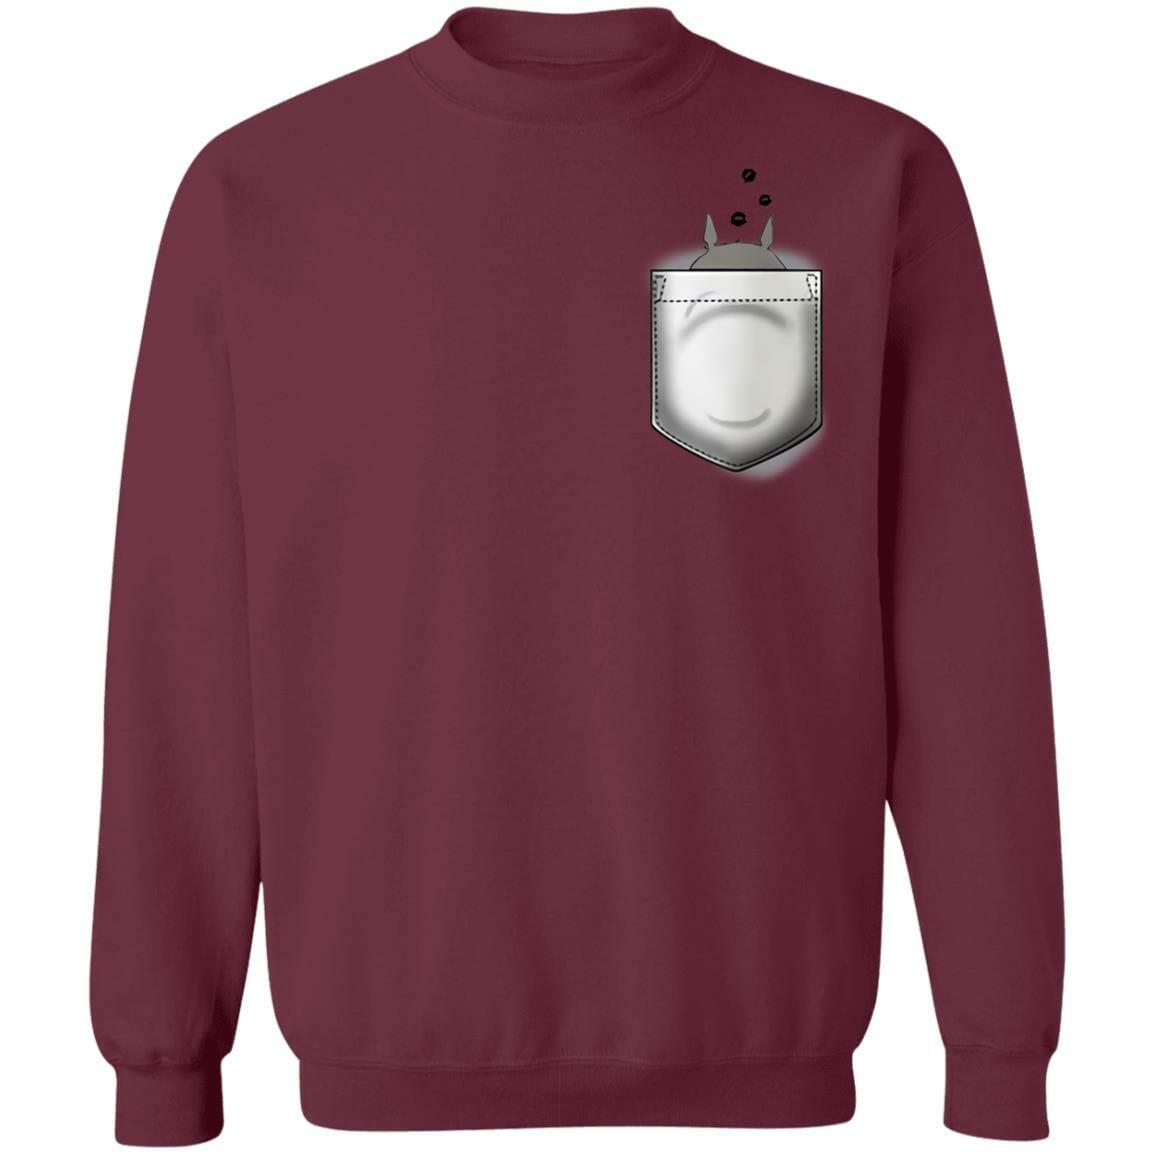 Totoro and Soot Balls in Pocket Sweatshirt